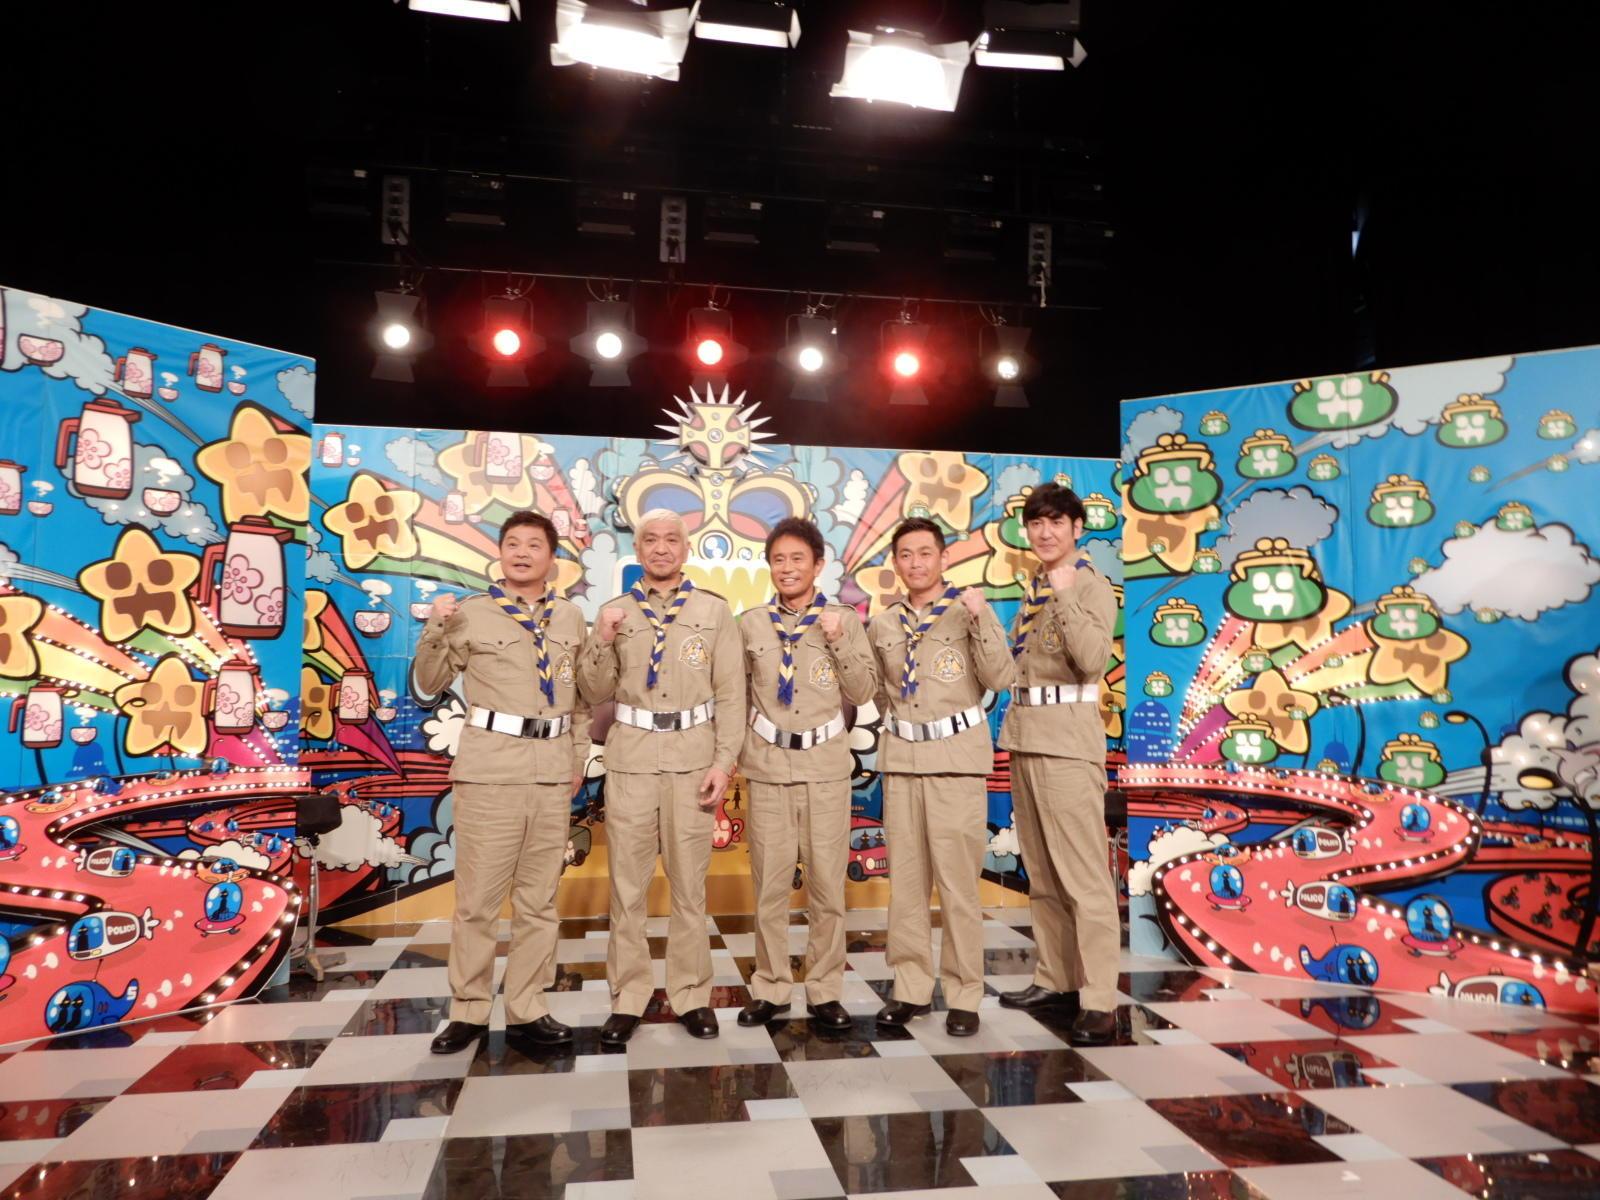 http://news.yoshimoto.co.jp/20181205183150-646185f895621693bec6d28f11d31949811c1319.jpg